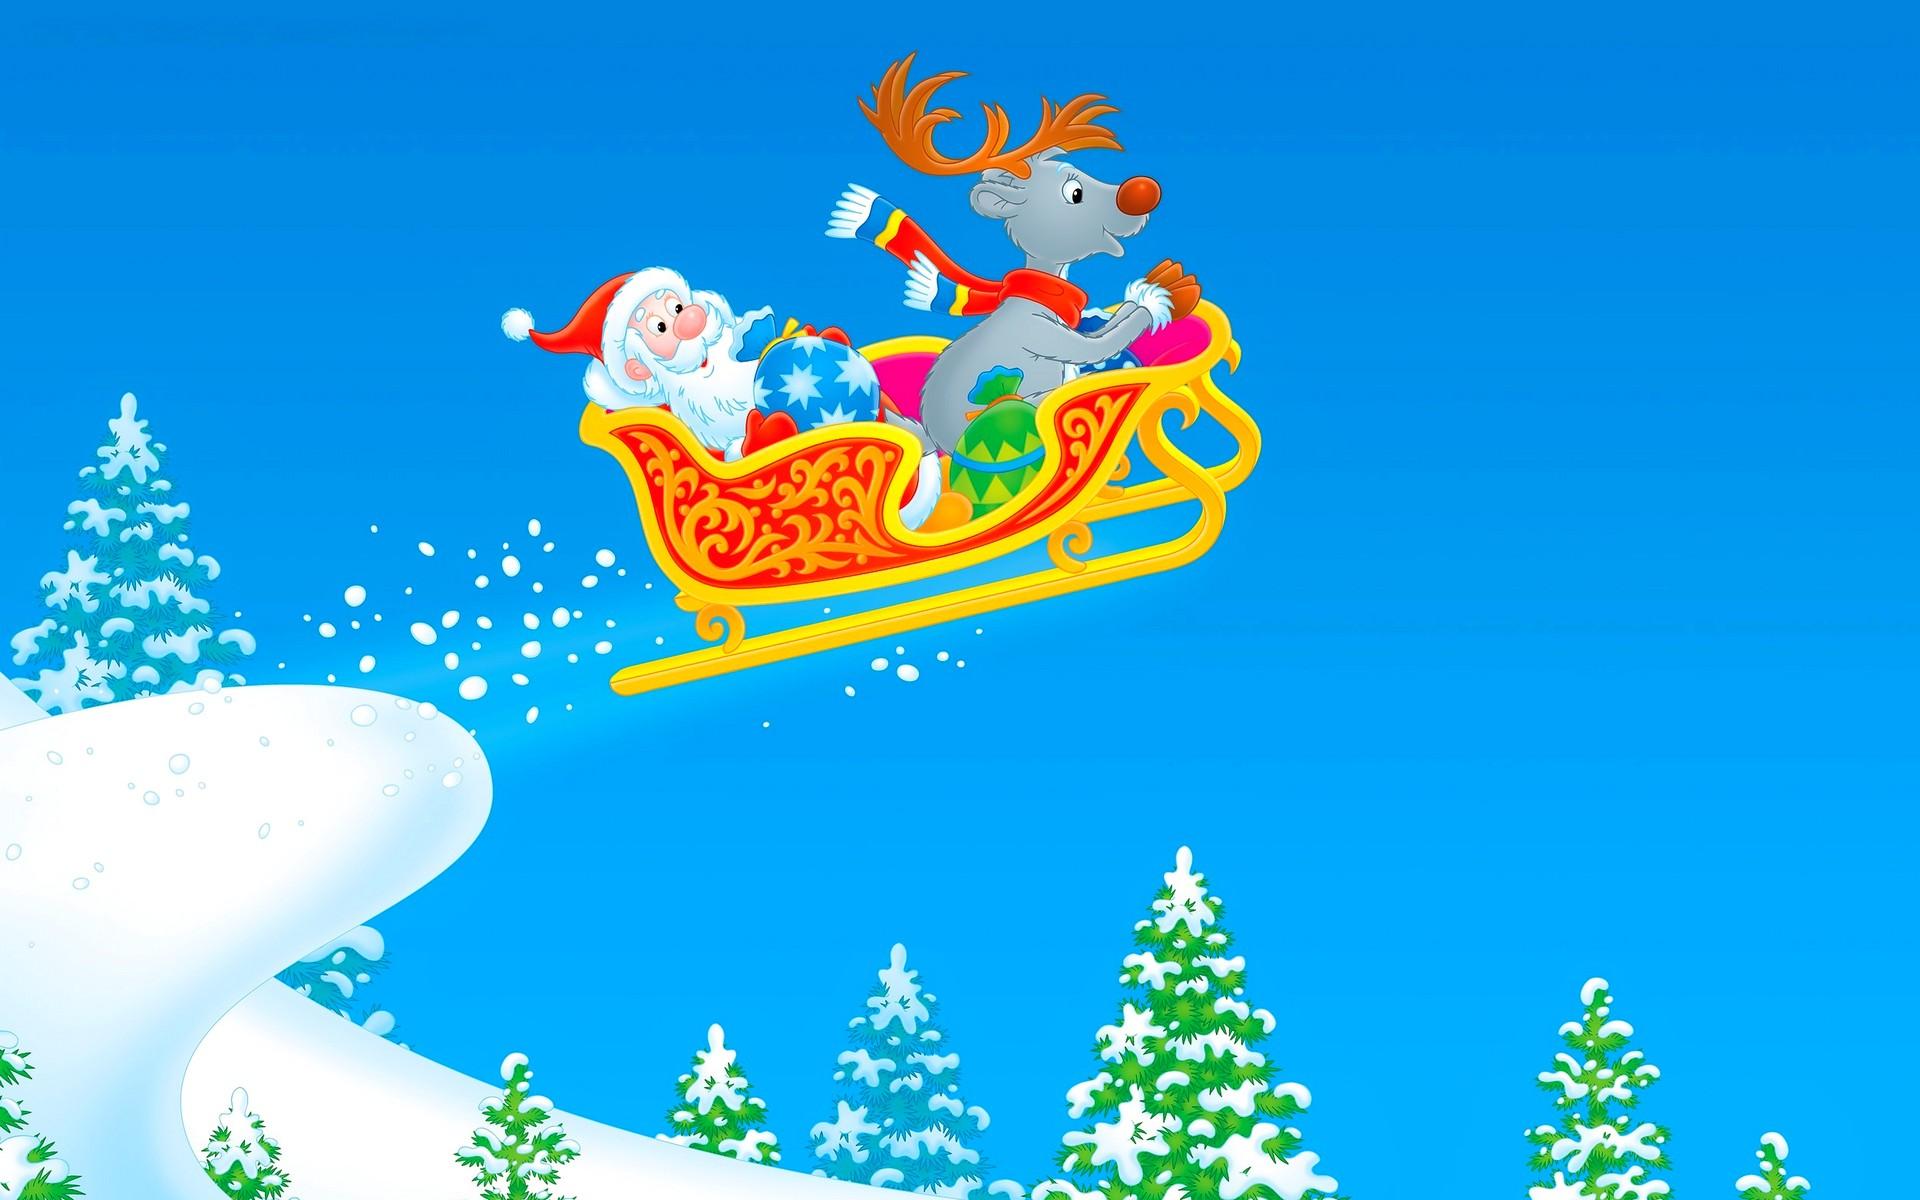 Дед мороз летит на санях